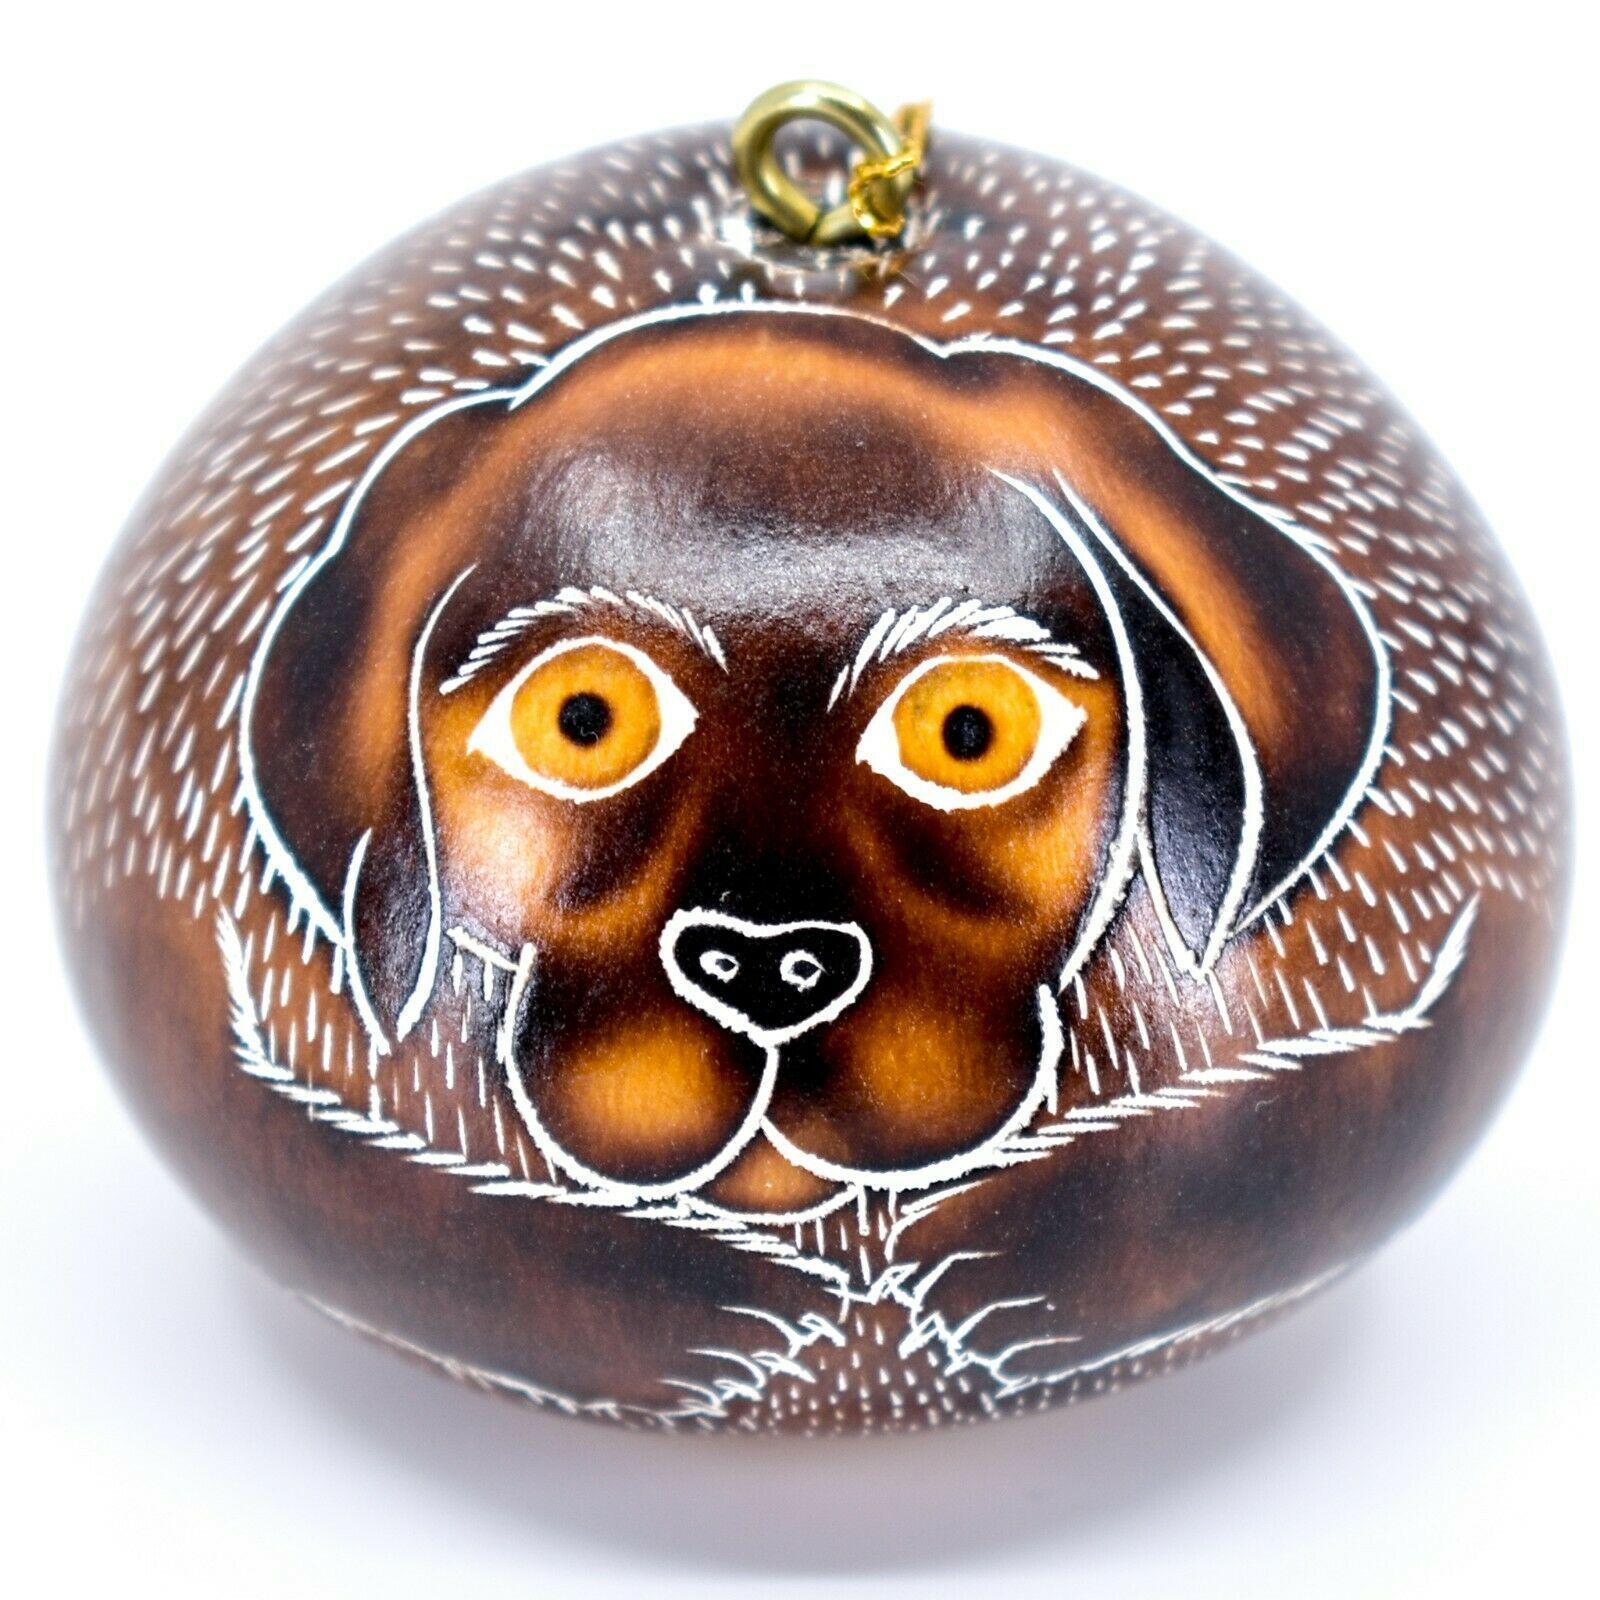 Handcrafted Carved Gourd Art Labrador Lab Puppy Dog Ornament Handmade in Peru